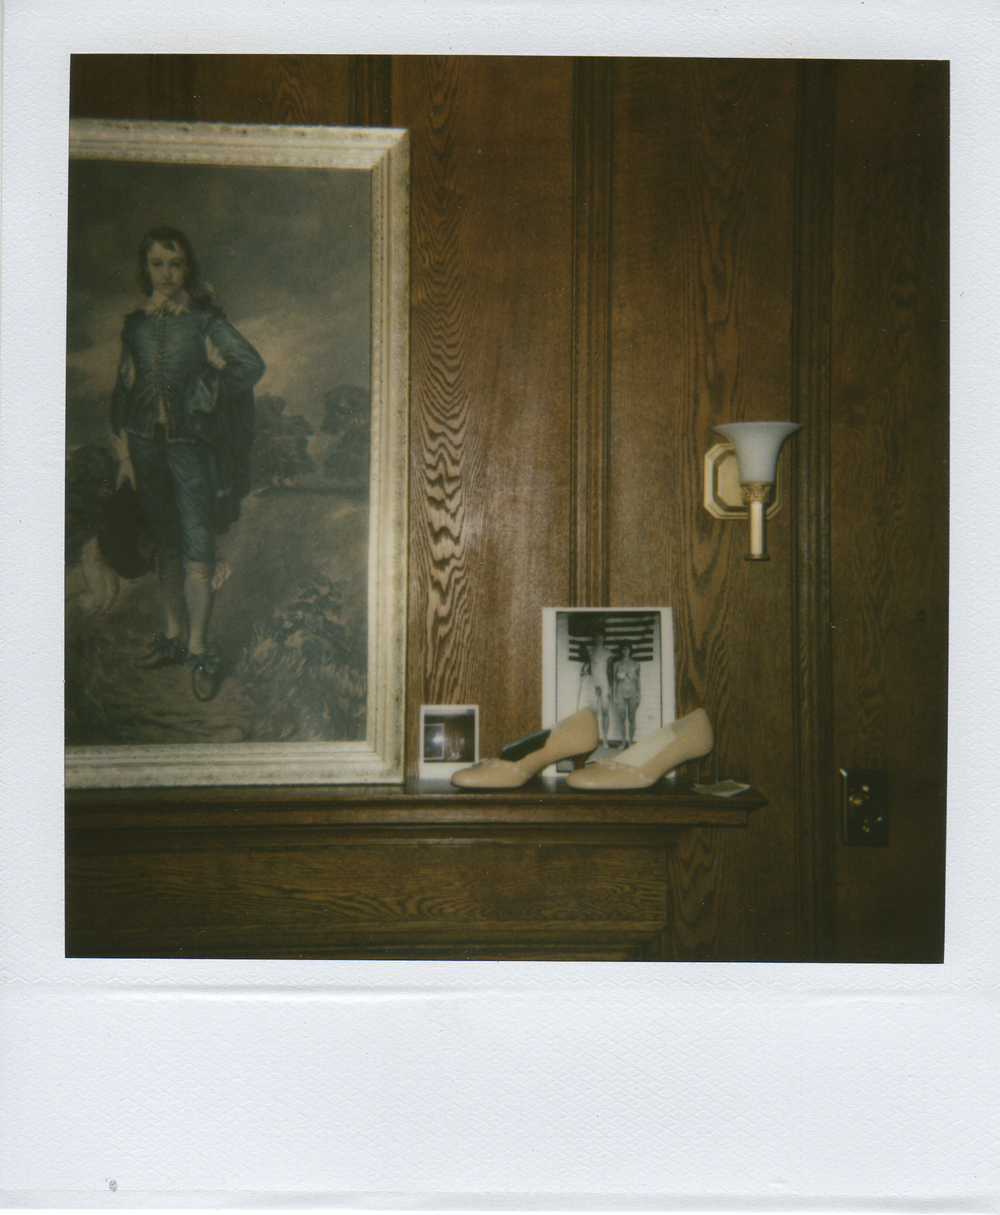 jlaurence-polaroid-008.jpg